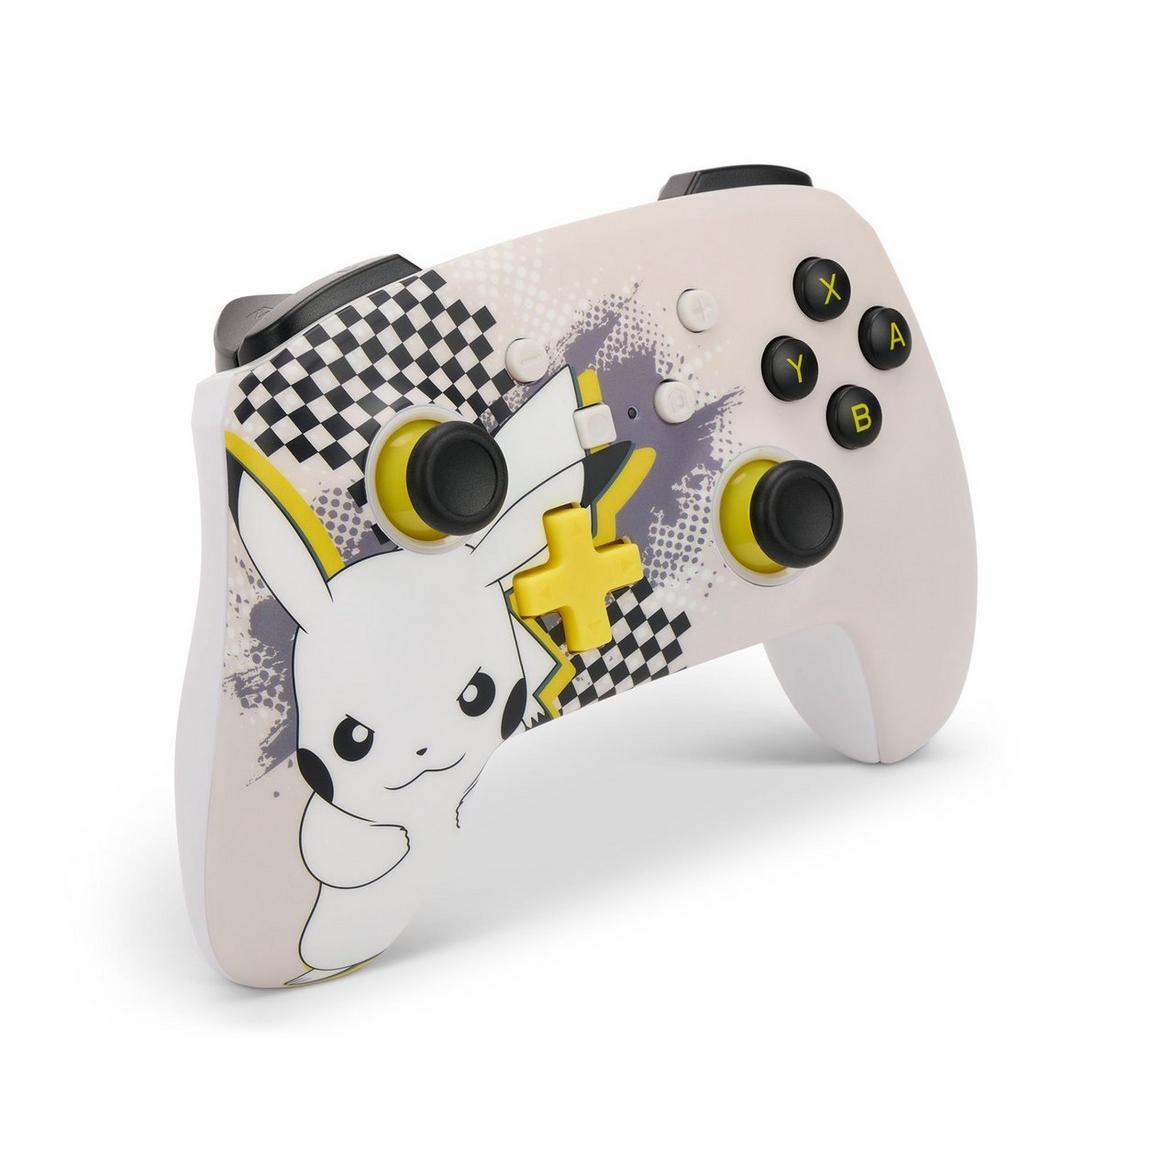 PowerA-Pro-Wireless-Controller-for-Nintendo-Switch---Pikachu?$pdp2x$